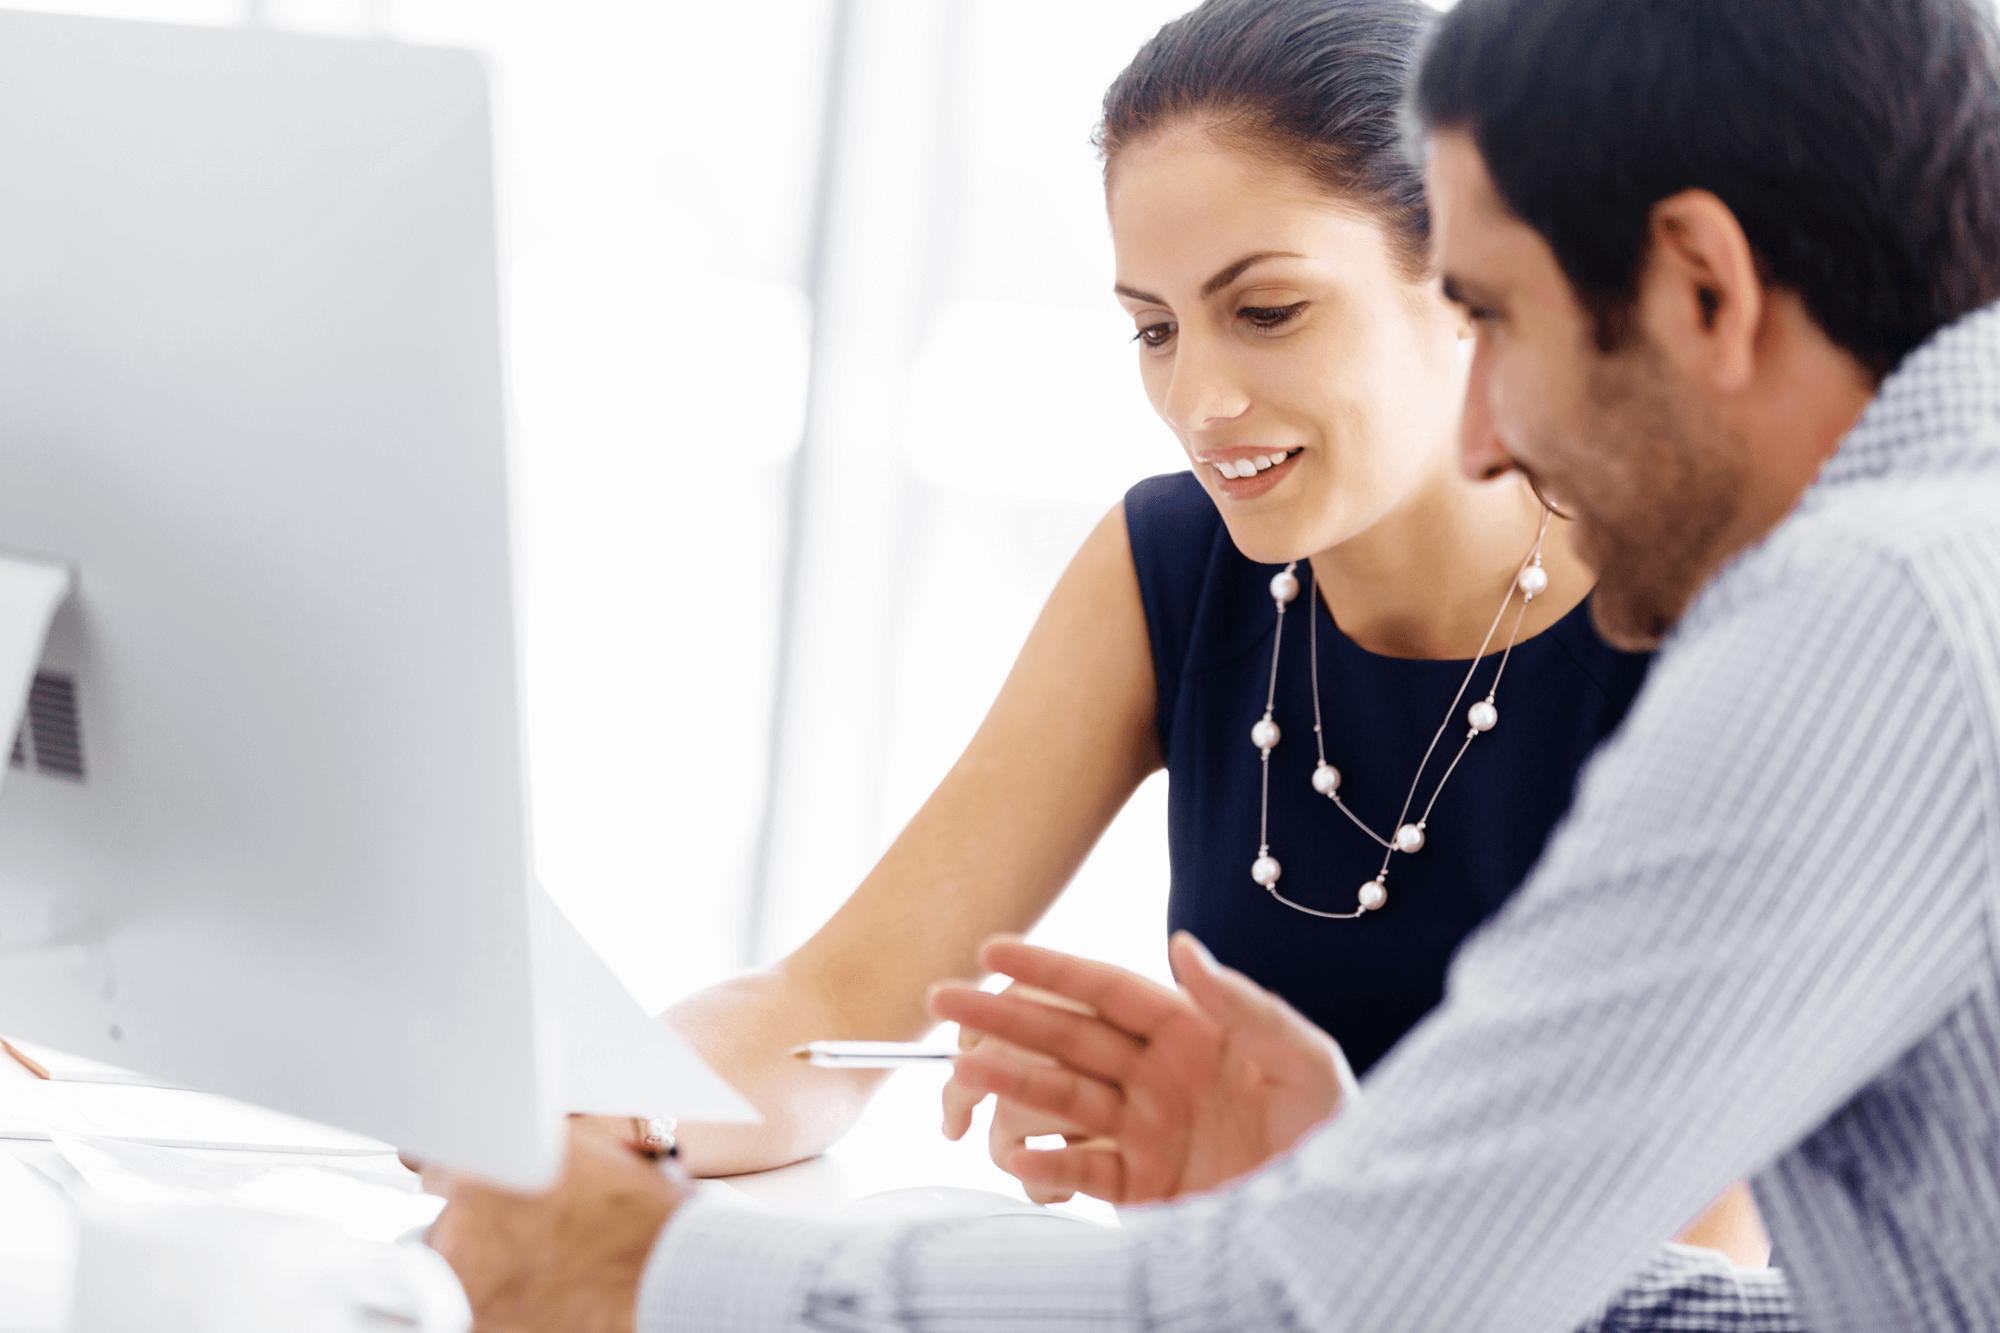 Agile Working | 100% agility | Pitfalls & Advantages | Advice